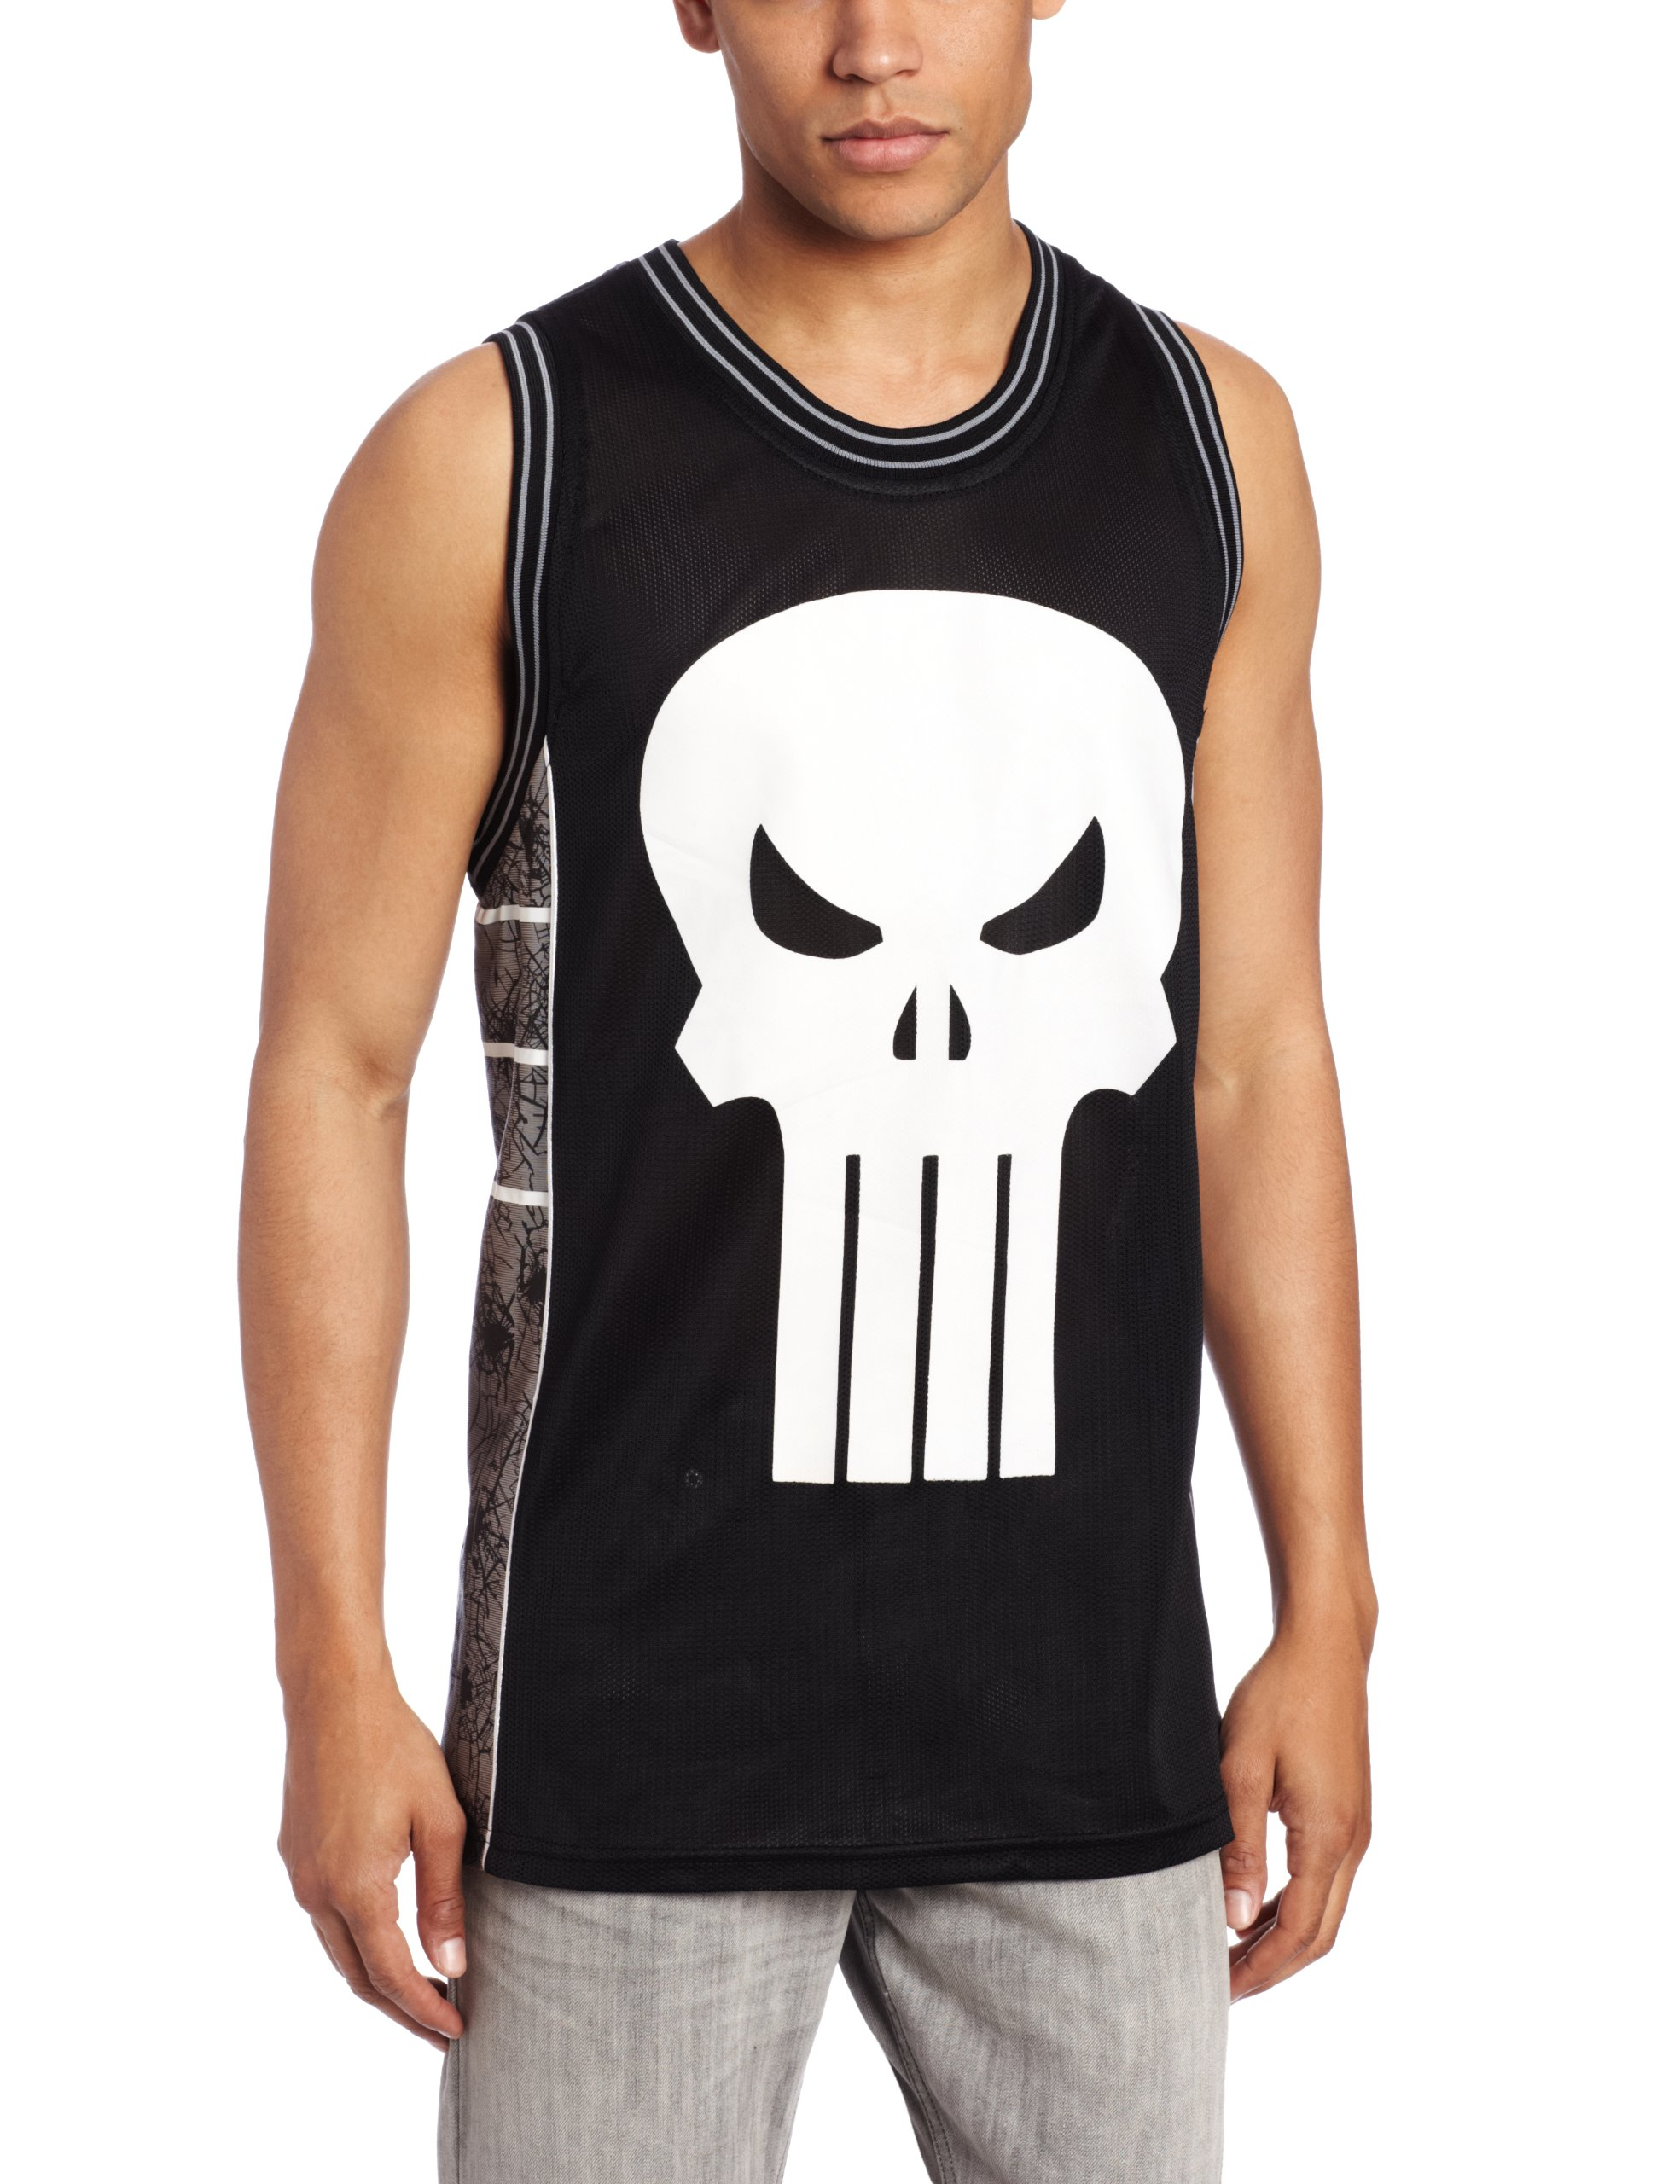 Men's Punisher Castle Basketball Jersey Shirt